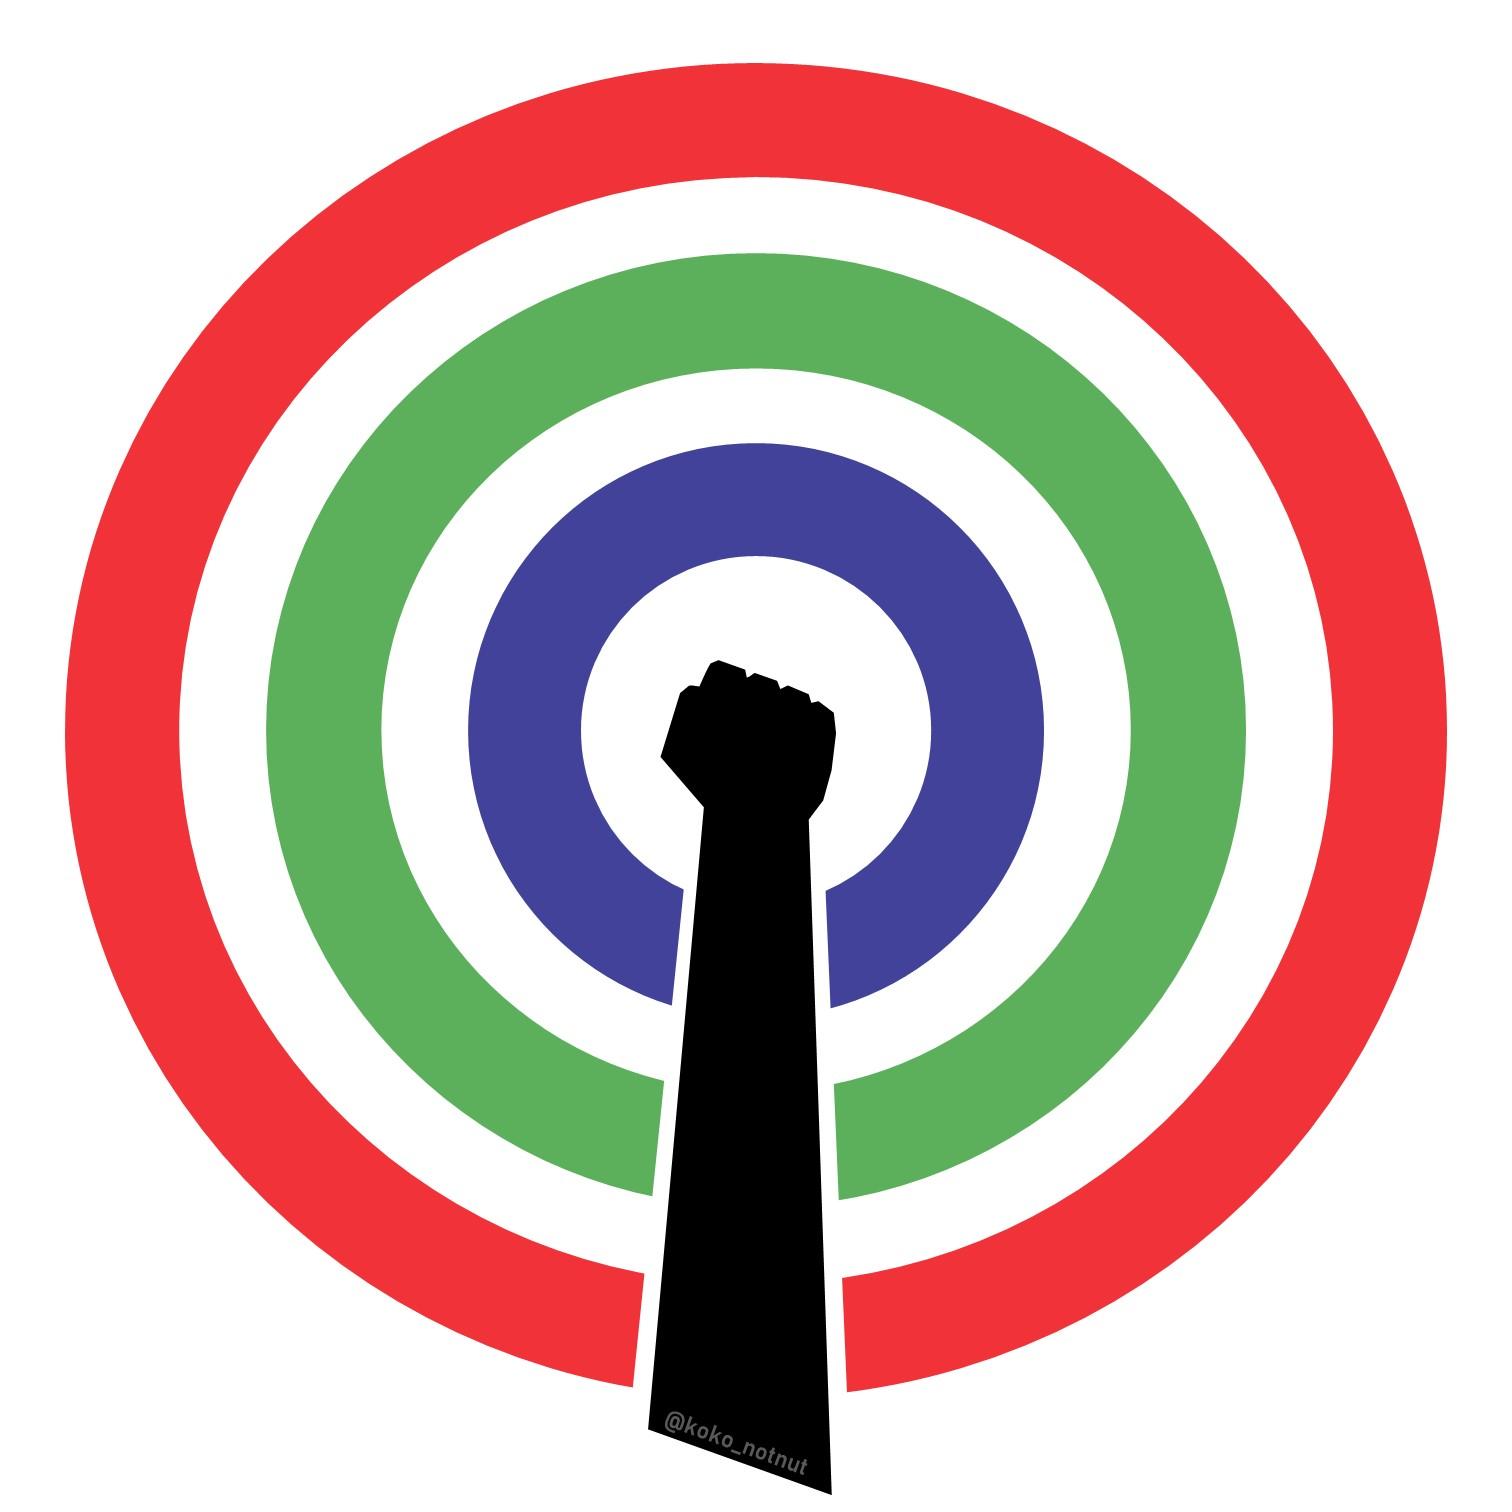 ABS-CBN Shutdown Logo Protest